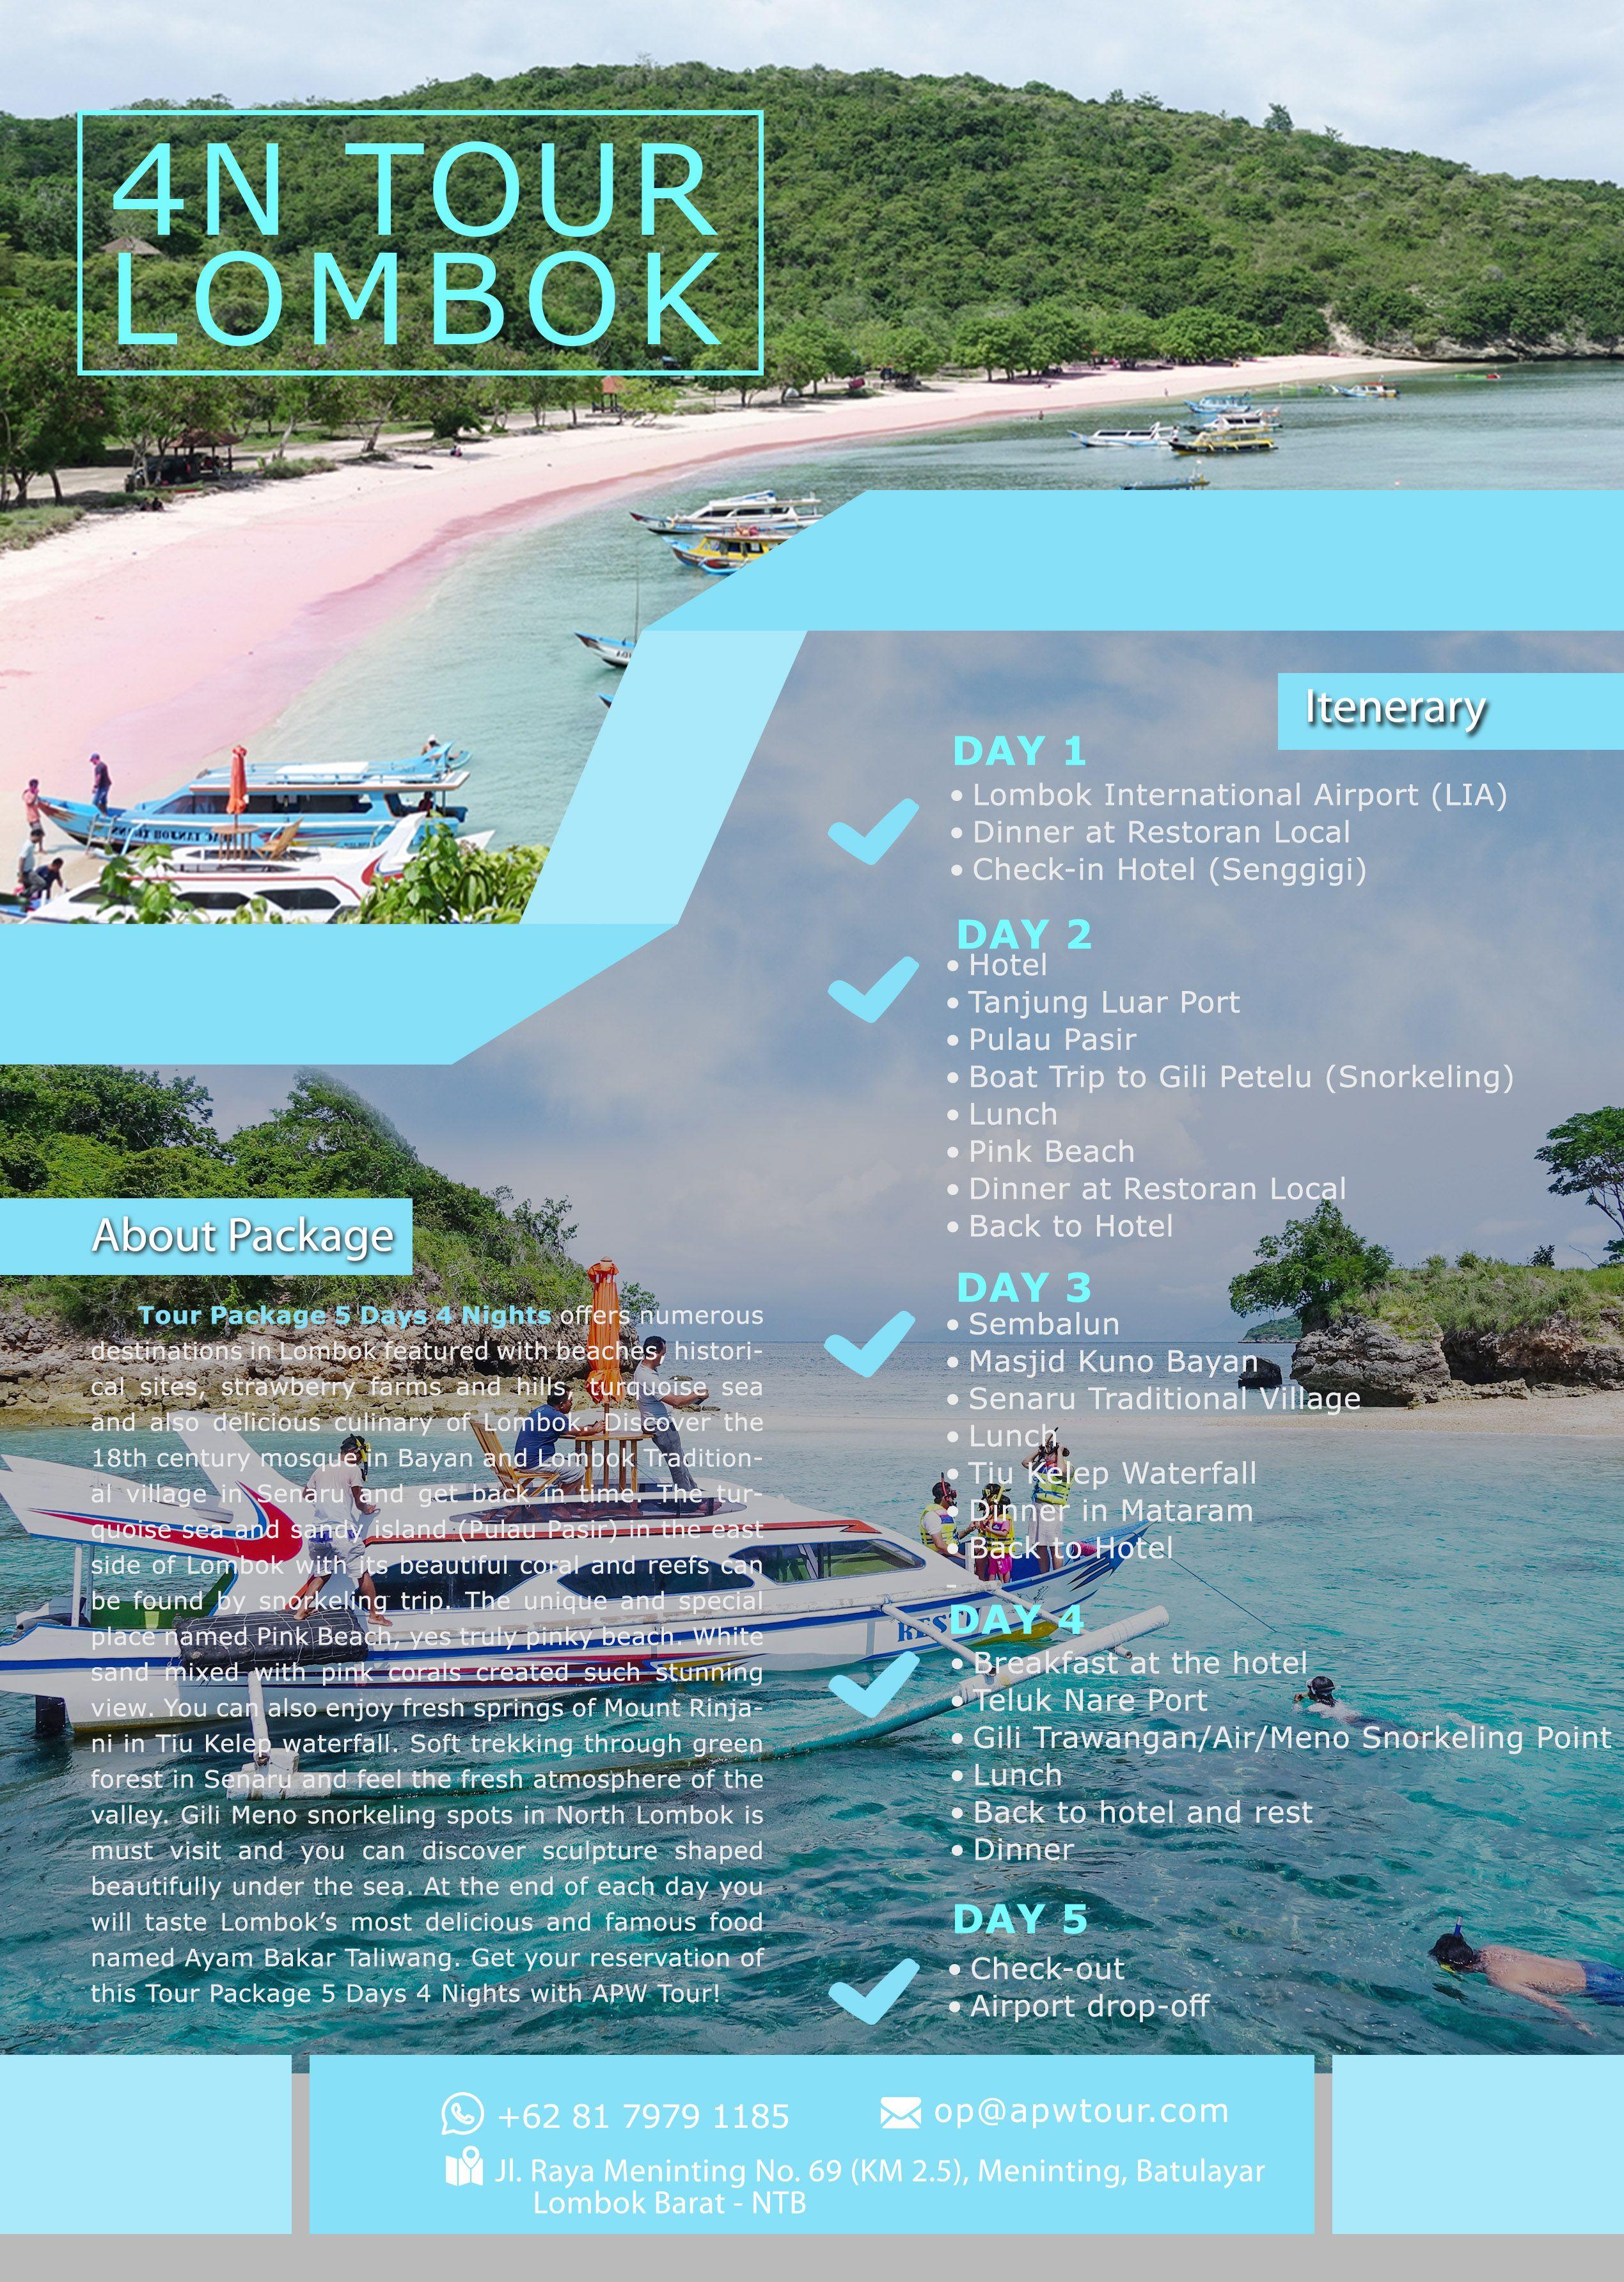 Tour Package 5 Days 4 Nights Offers Numerous Destinations In Lombok Paket Liburan Wisata Murah Aman Dan Nyaman Di Apw Travel